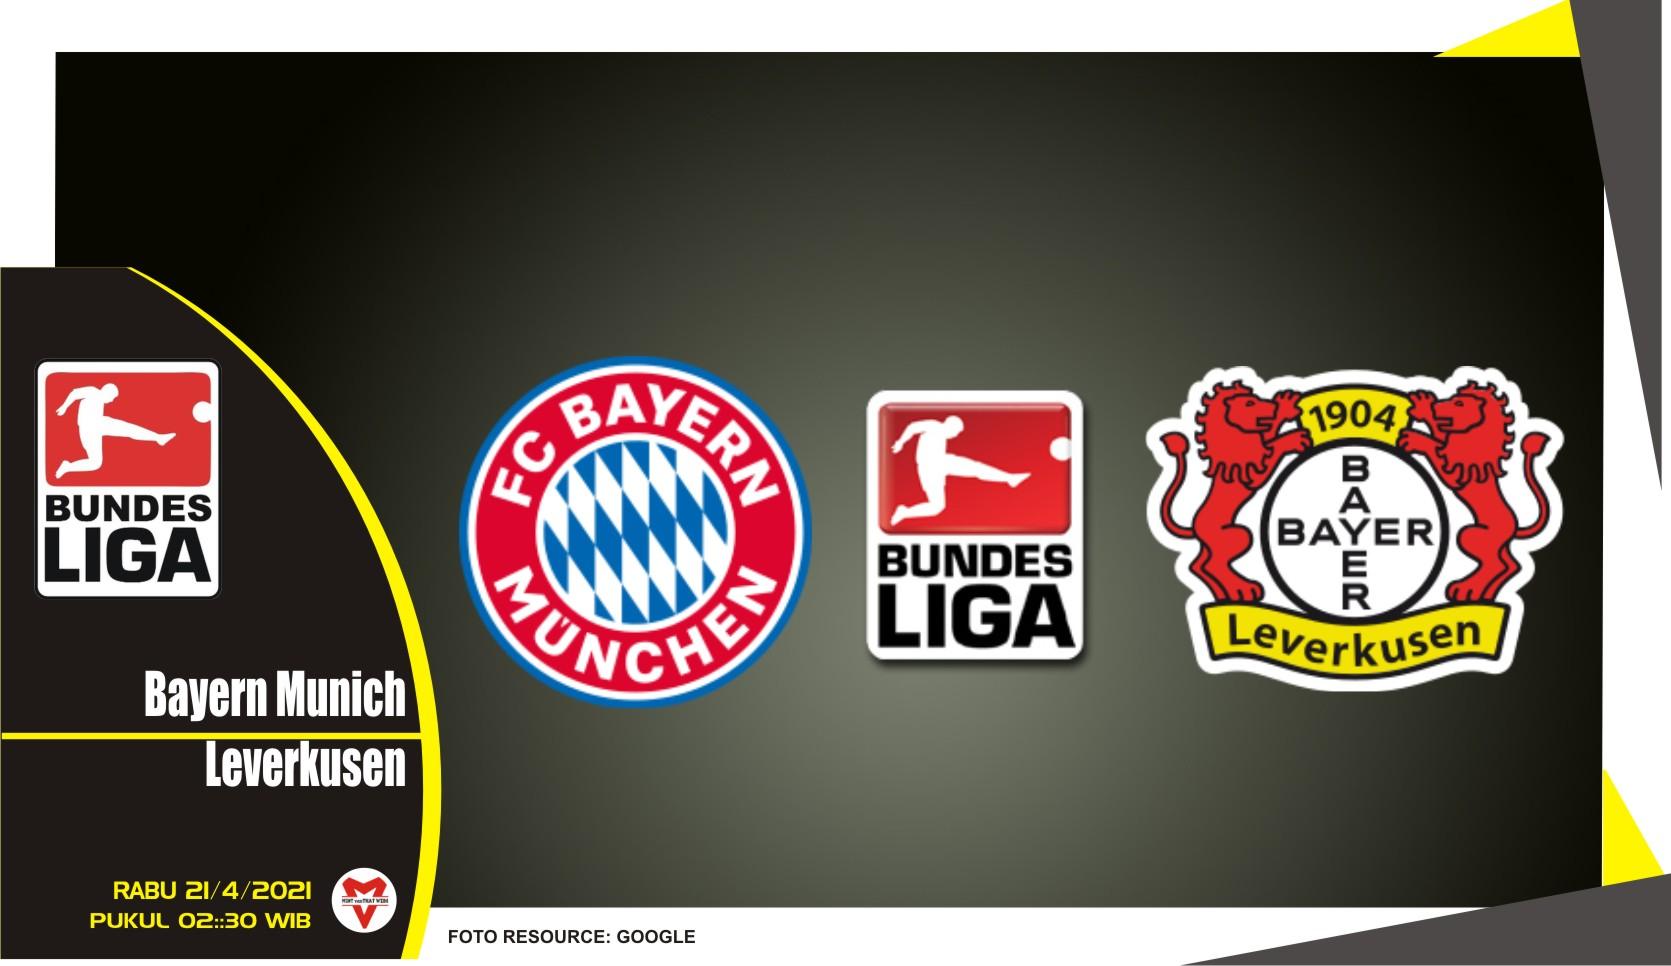 Prediksi Liga Jerman: Bayern Munich vs Leverkusen - 21 April 2021